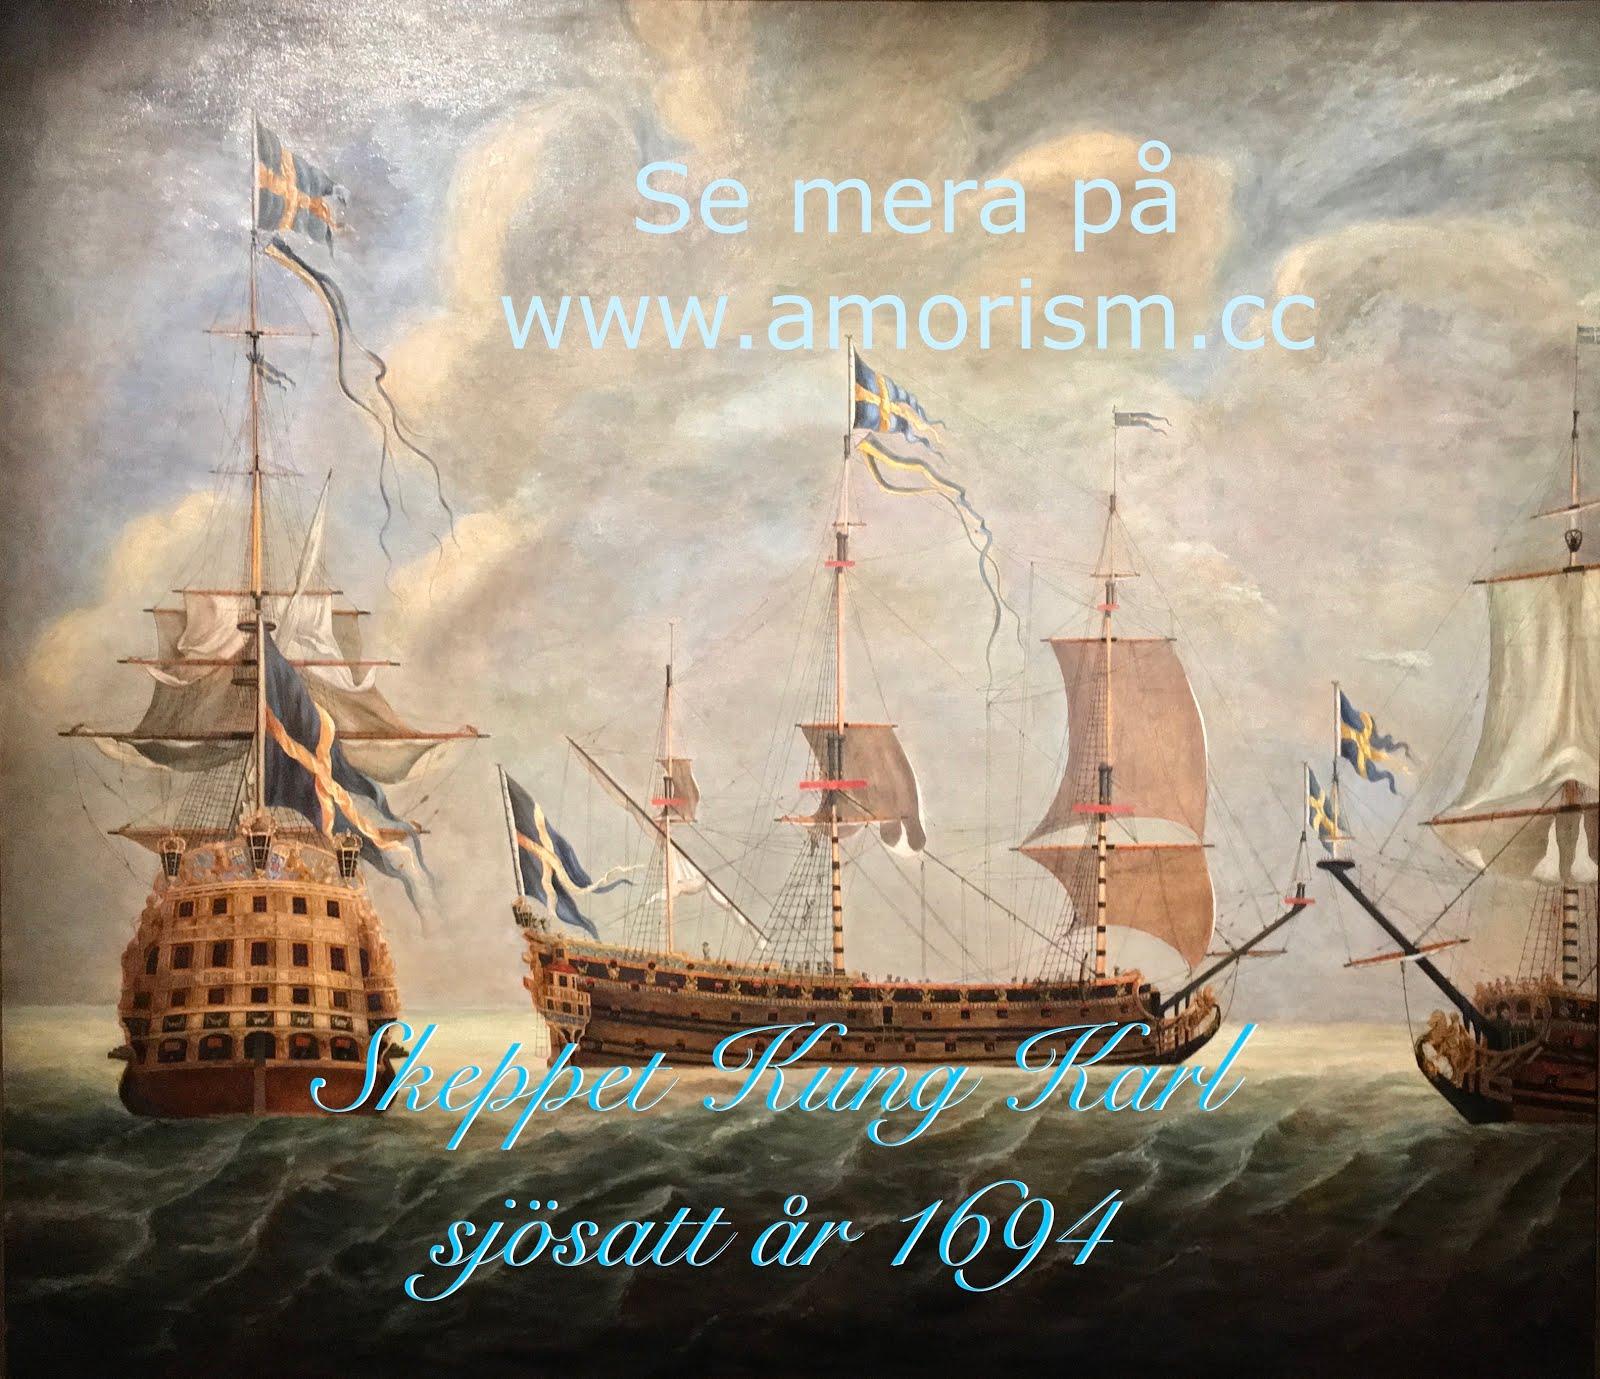 Img. jpg. Ship Konung Karl